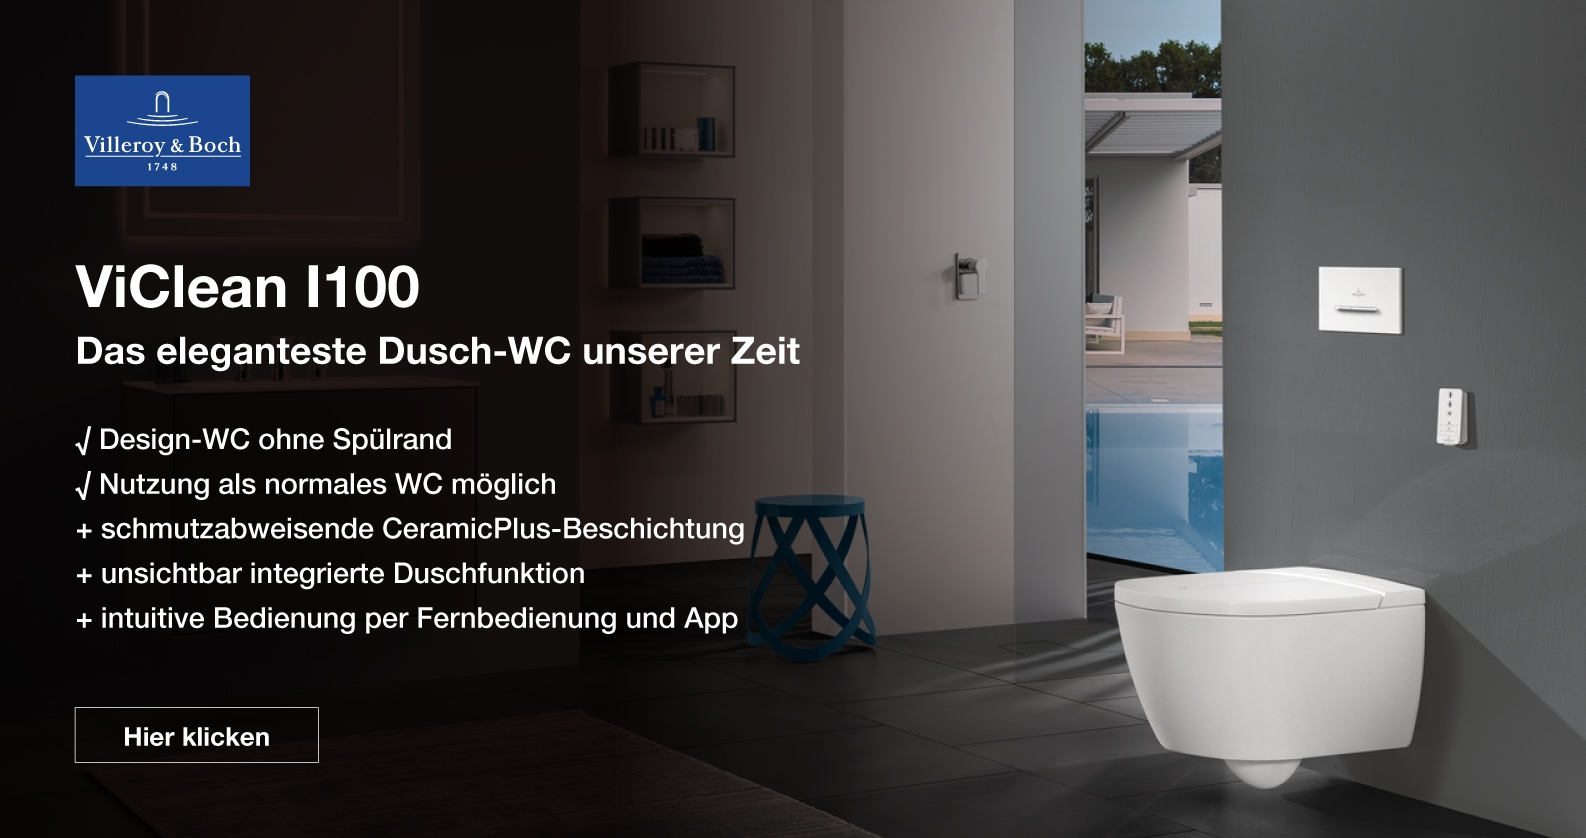 Villeroy & Boch ViClean Dusch-WC